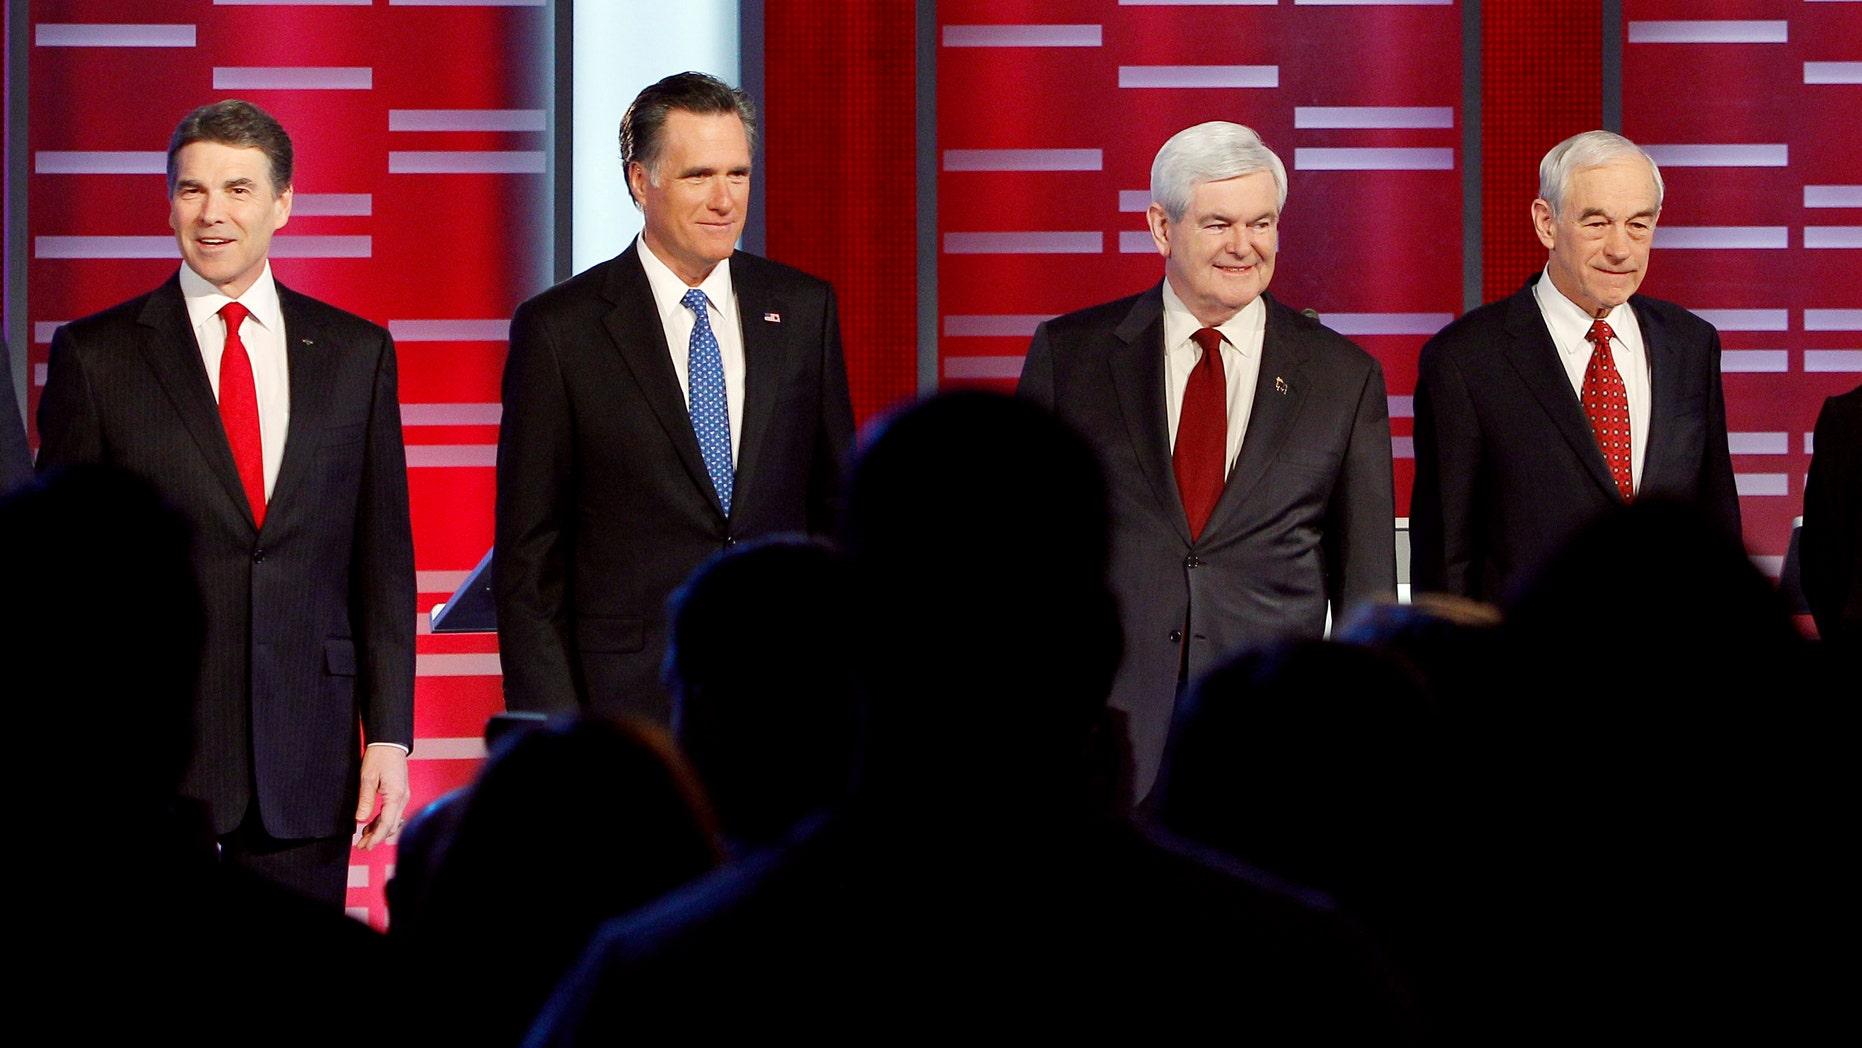 Former Pennsylvania Sen. Rick Santorum, Texas Gov. Rick Perry, former Massachusetts Gov. Mitt Romney, former Speaker of the House Newt Gingrich, Rep. Ron Paul, R-Texas, and Rep. Michele Bachmann, R-Minn, prior to their Republican debate, Saturday, Dec. 10, 2011, in Des Moines, Iowa.